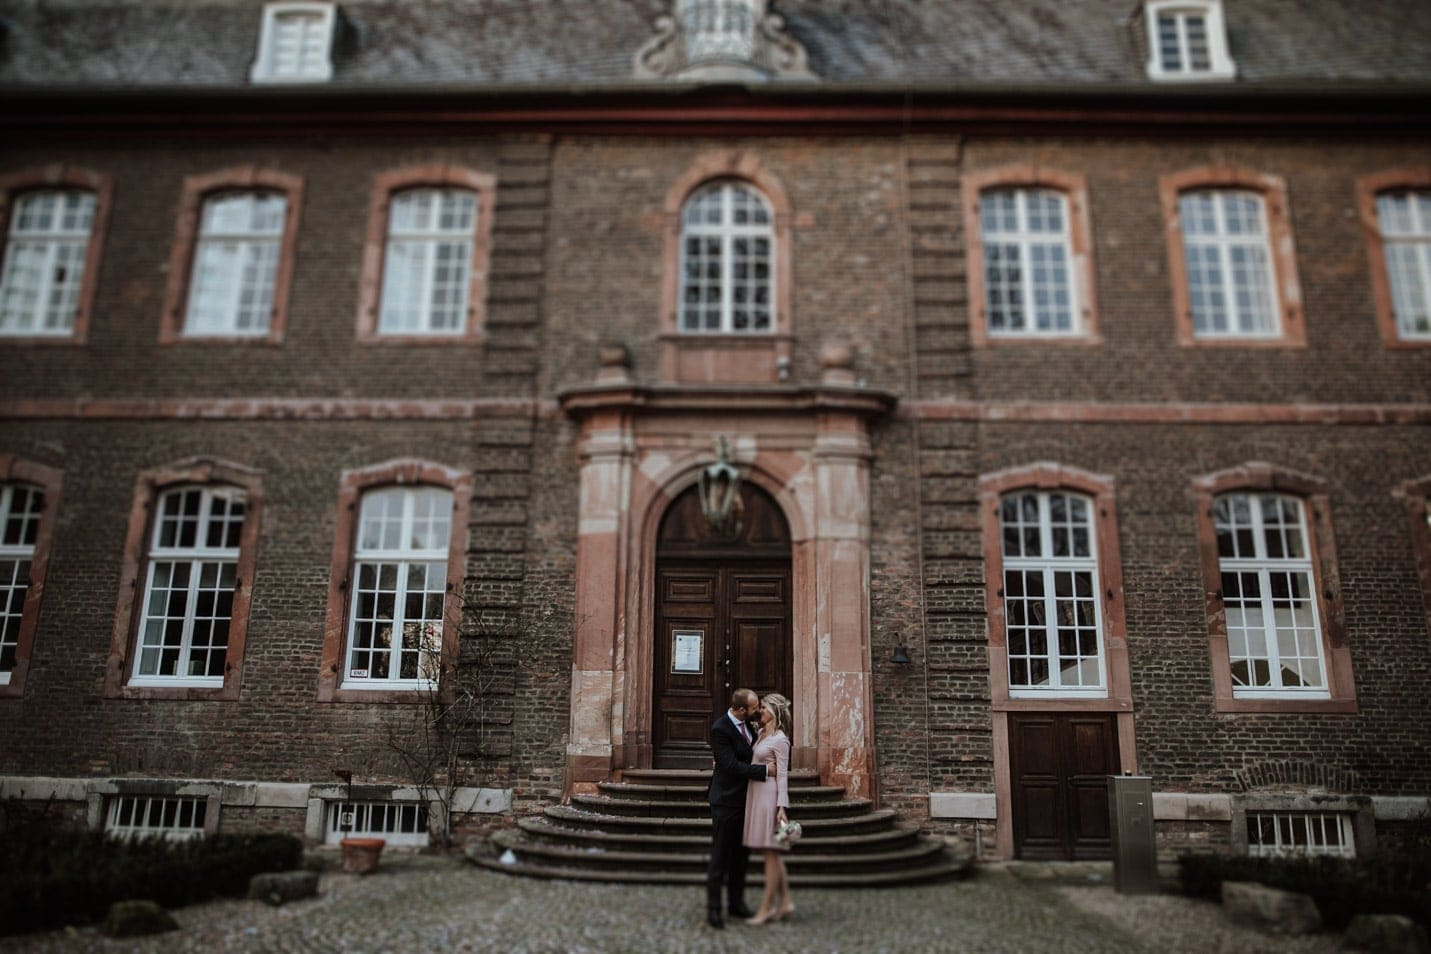 Brautpaar küsst sich vor Schloss Wahn köln